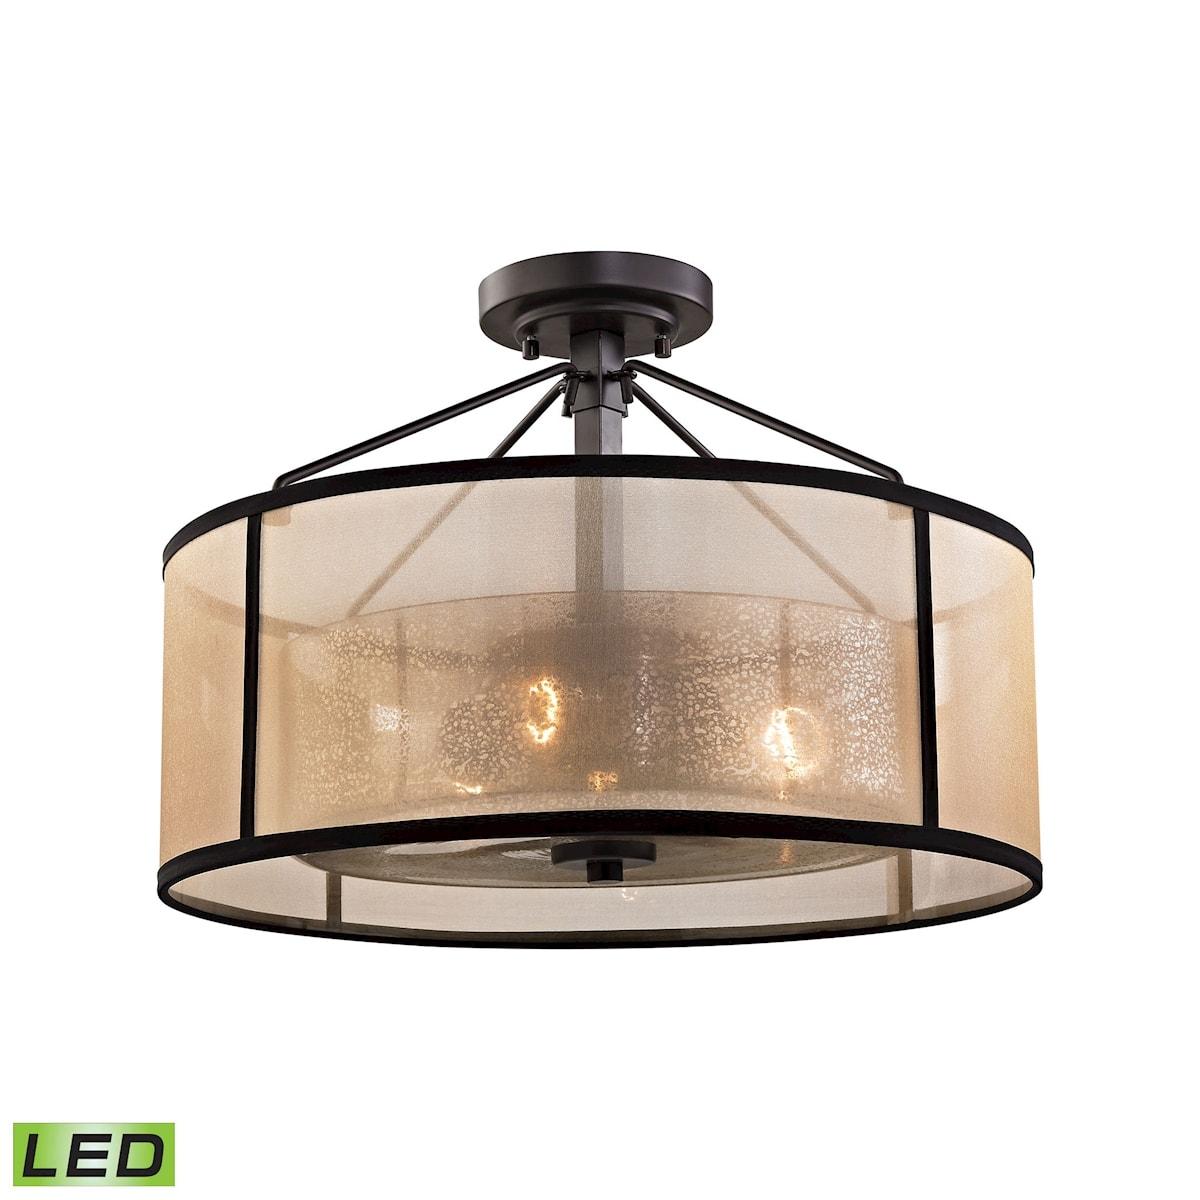 EL-57024/3-LED_Diffusion 3-Light Semi-Flush in Oil Rubbed Bronze - LED